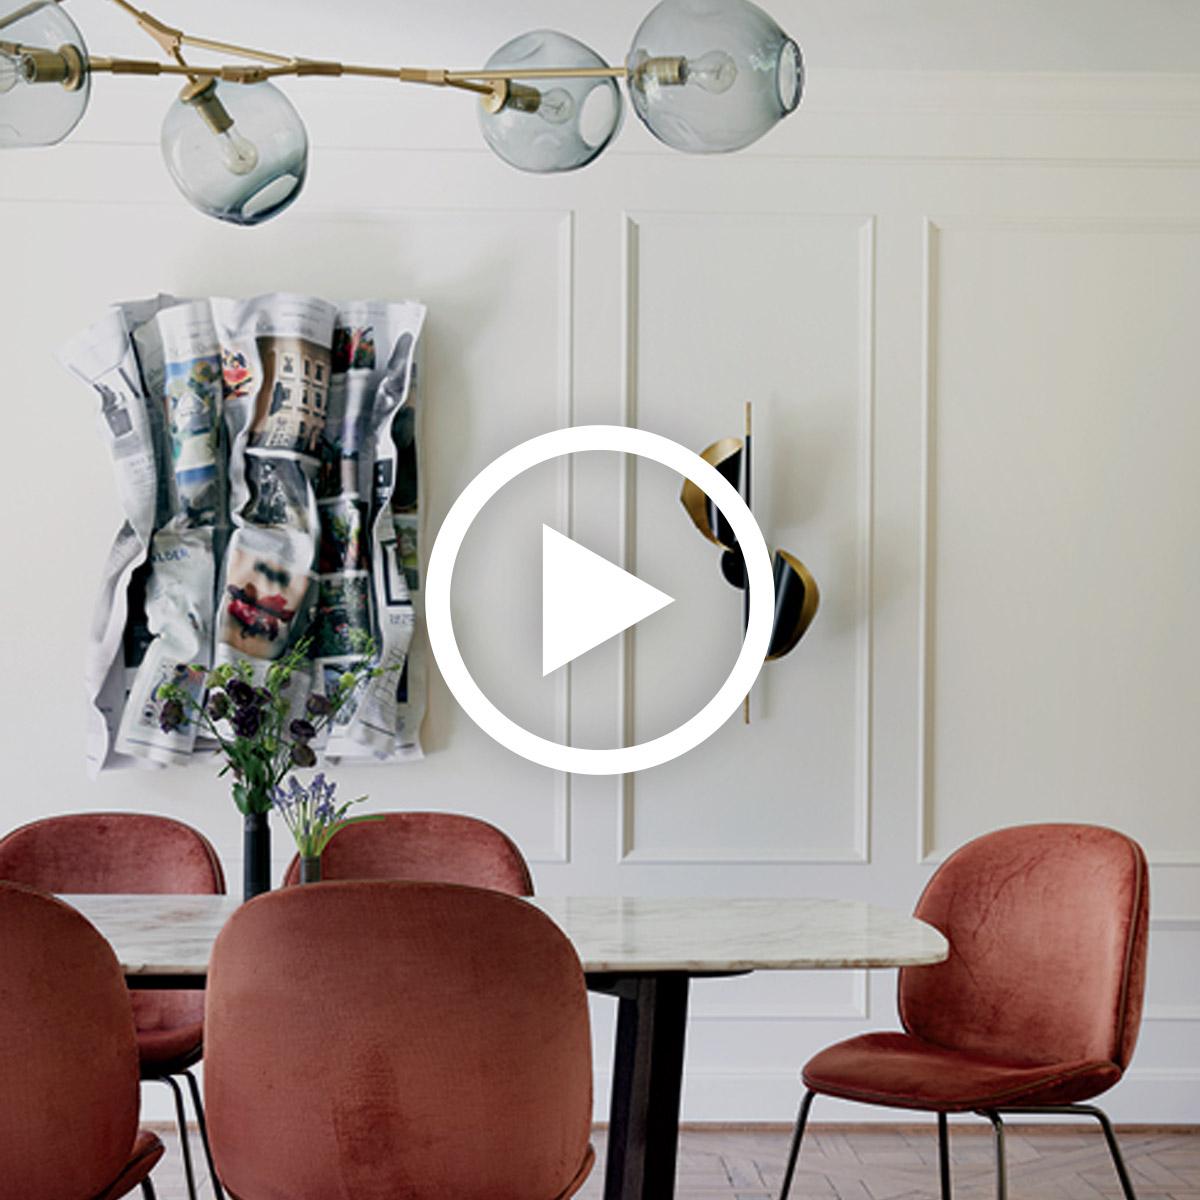 Luxe Design Tour With Meg Lonergan